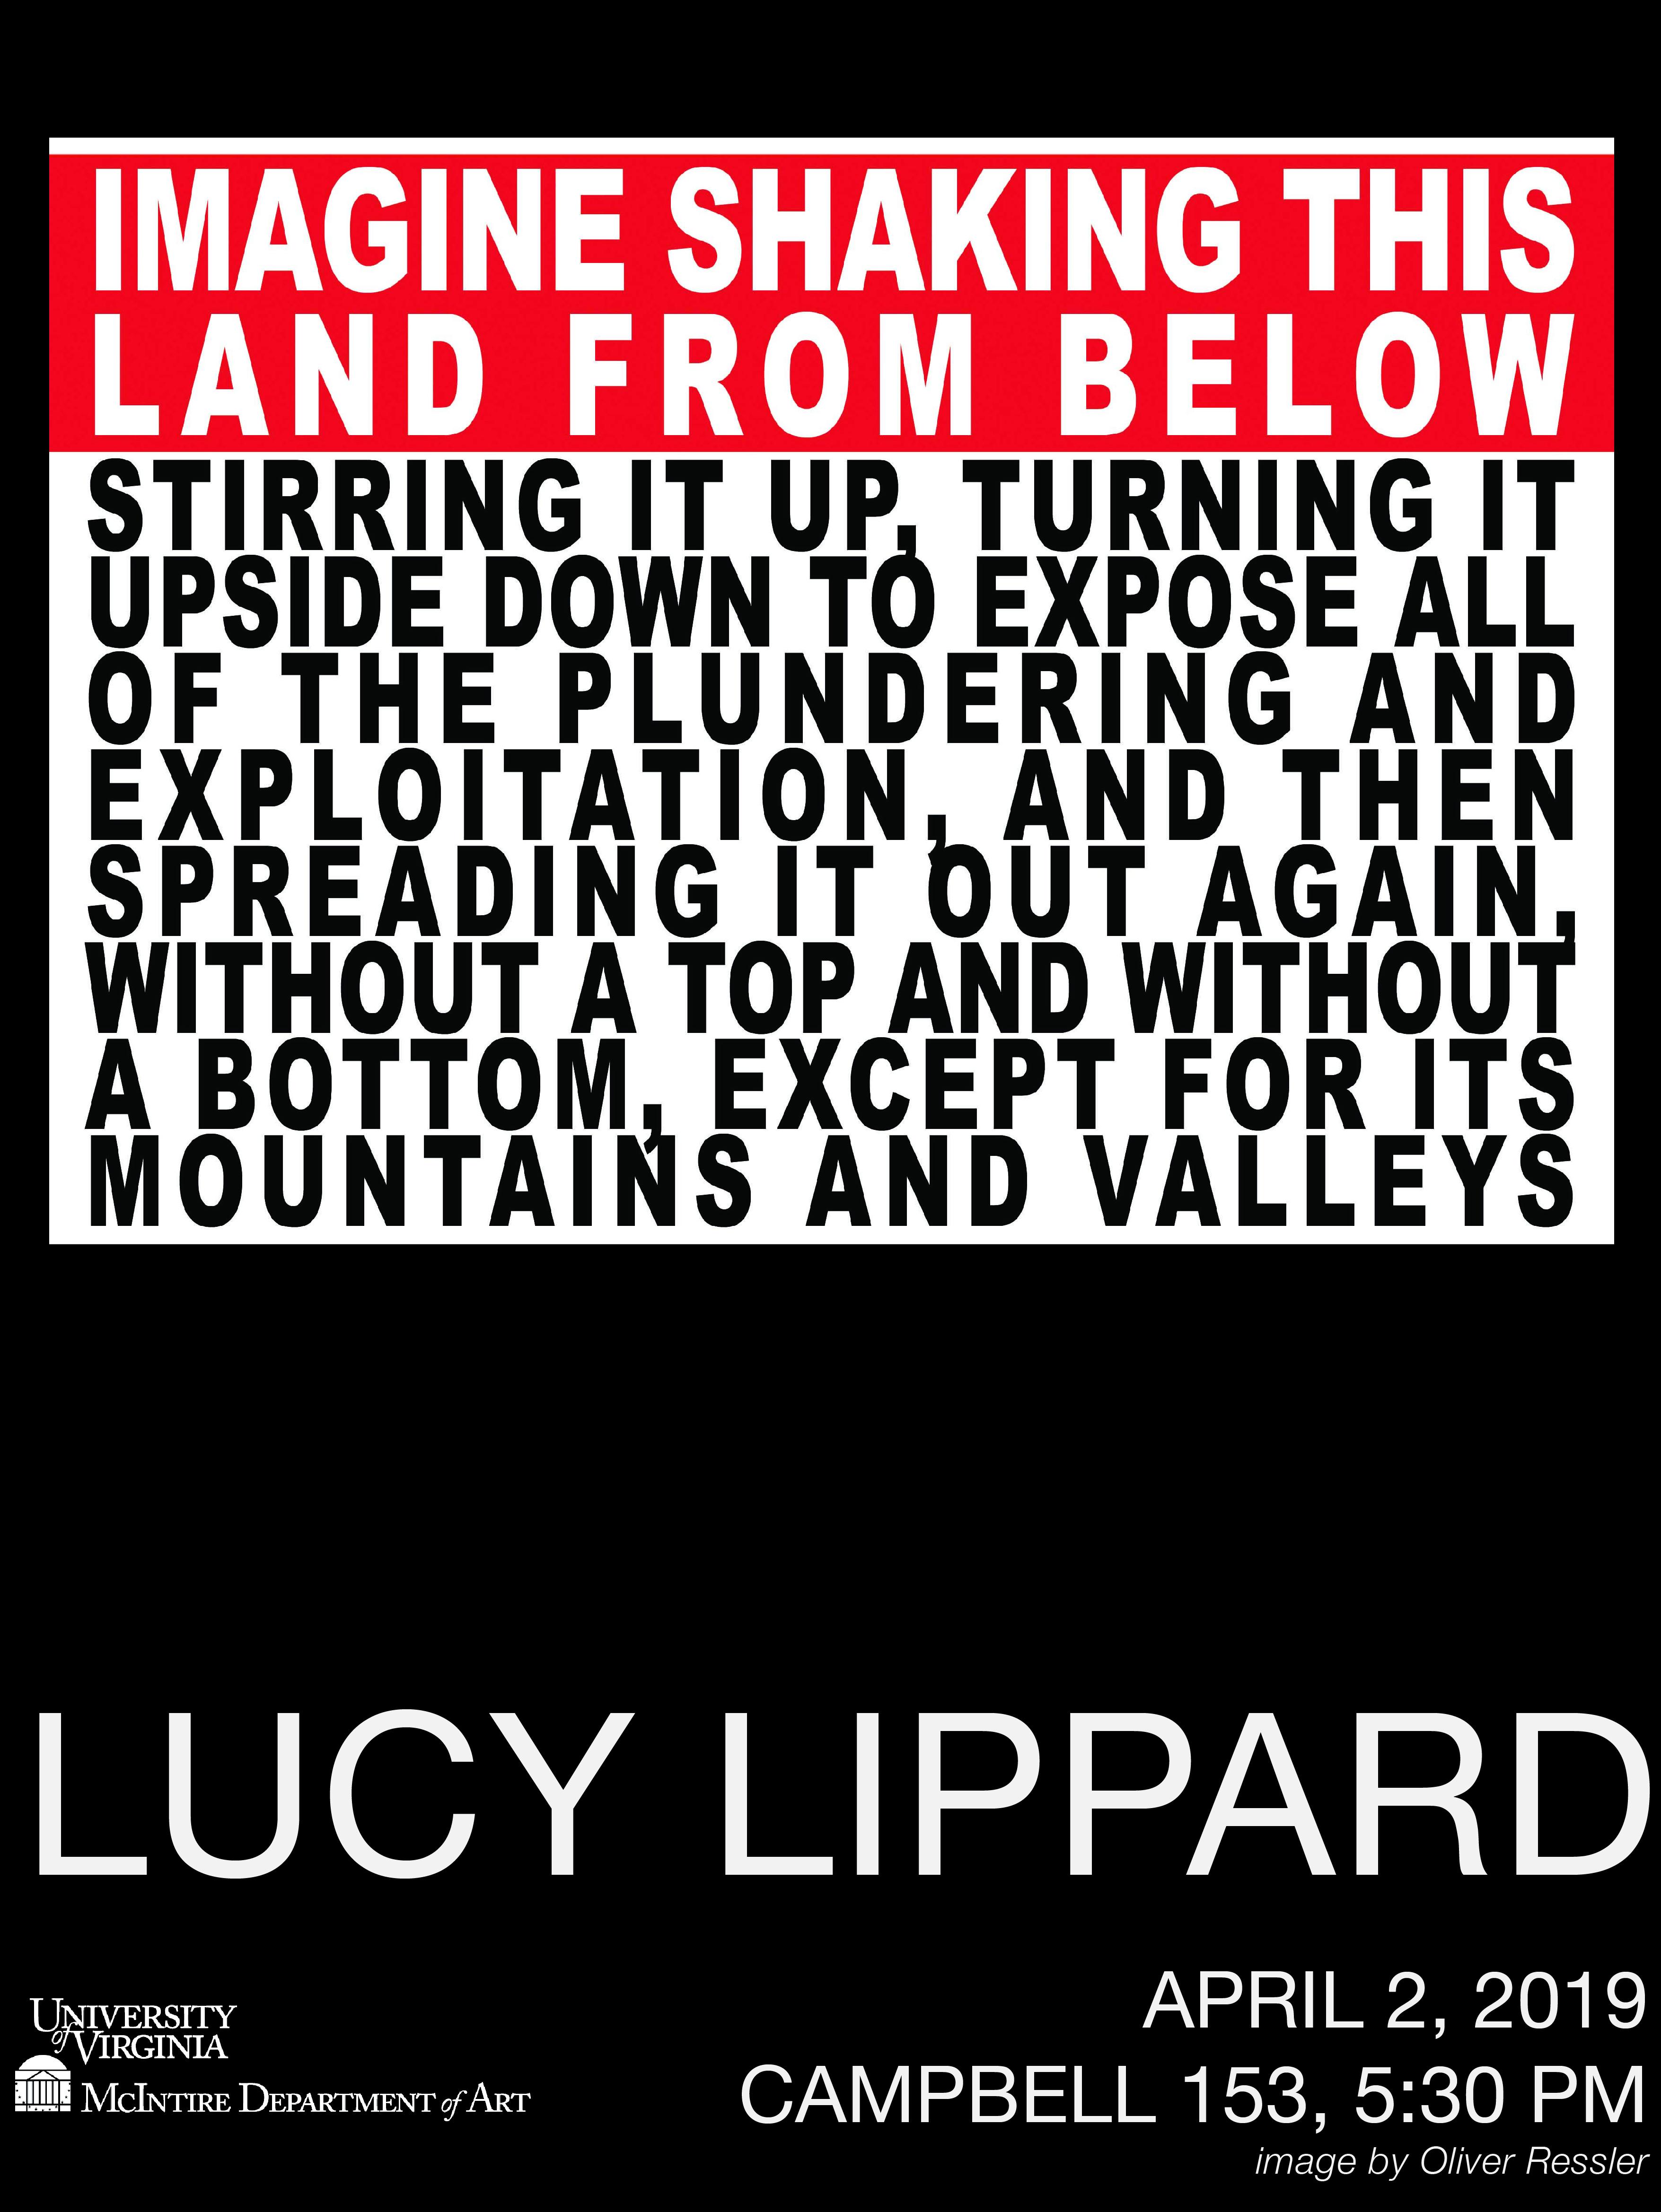 Lucy Lippard